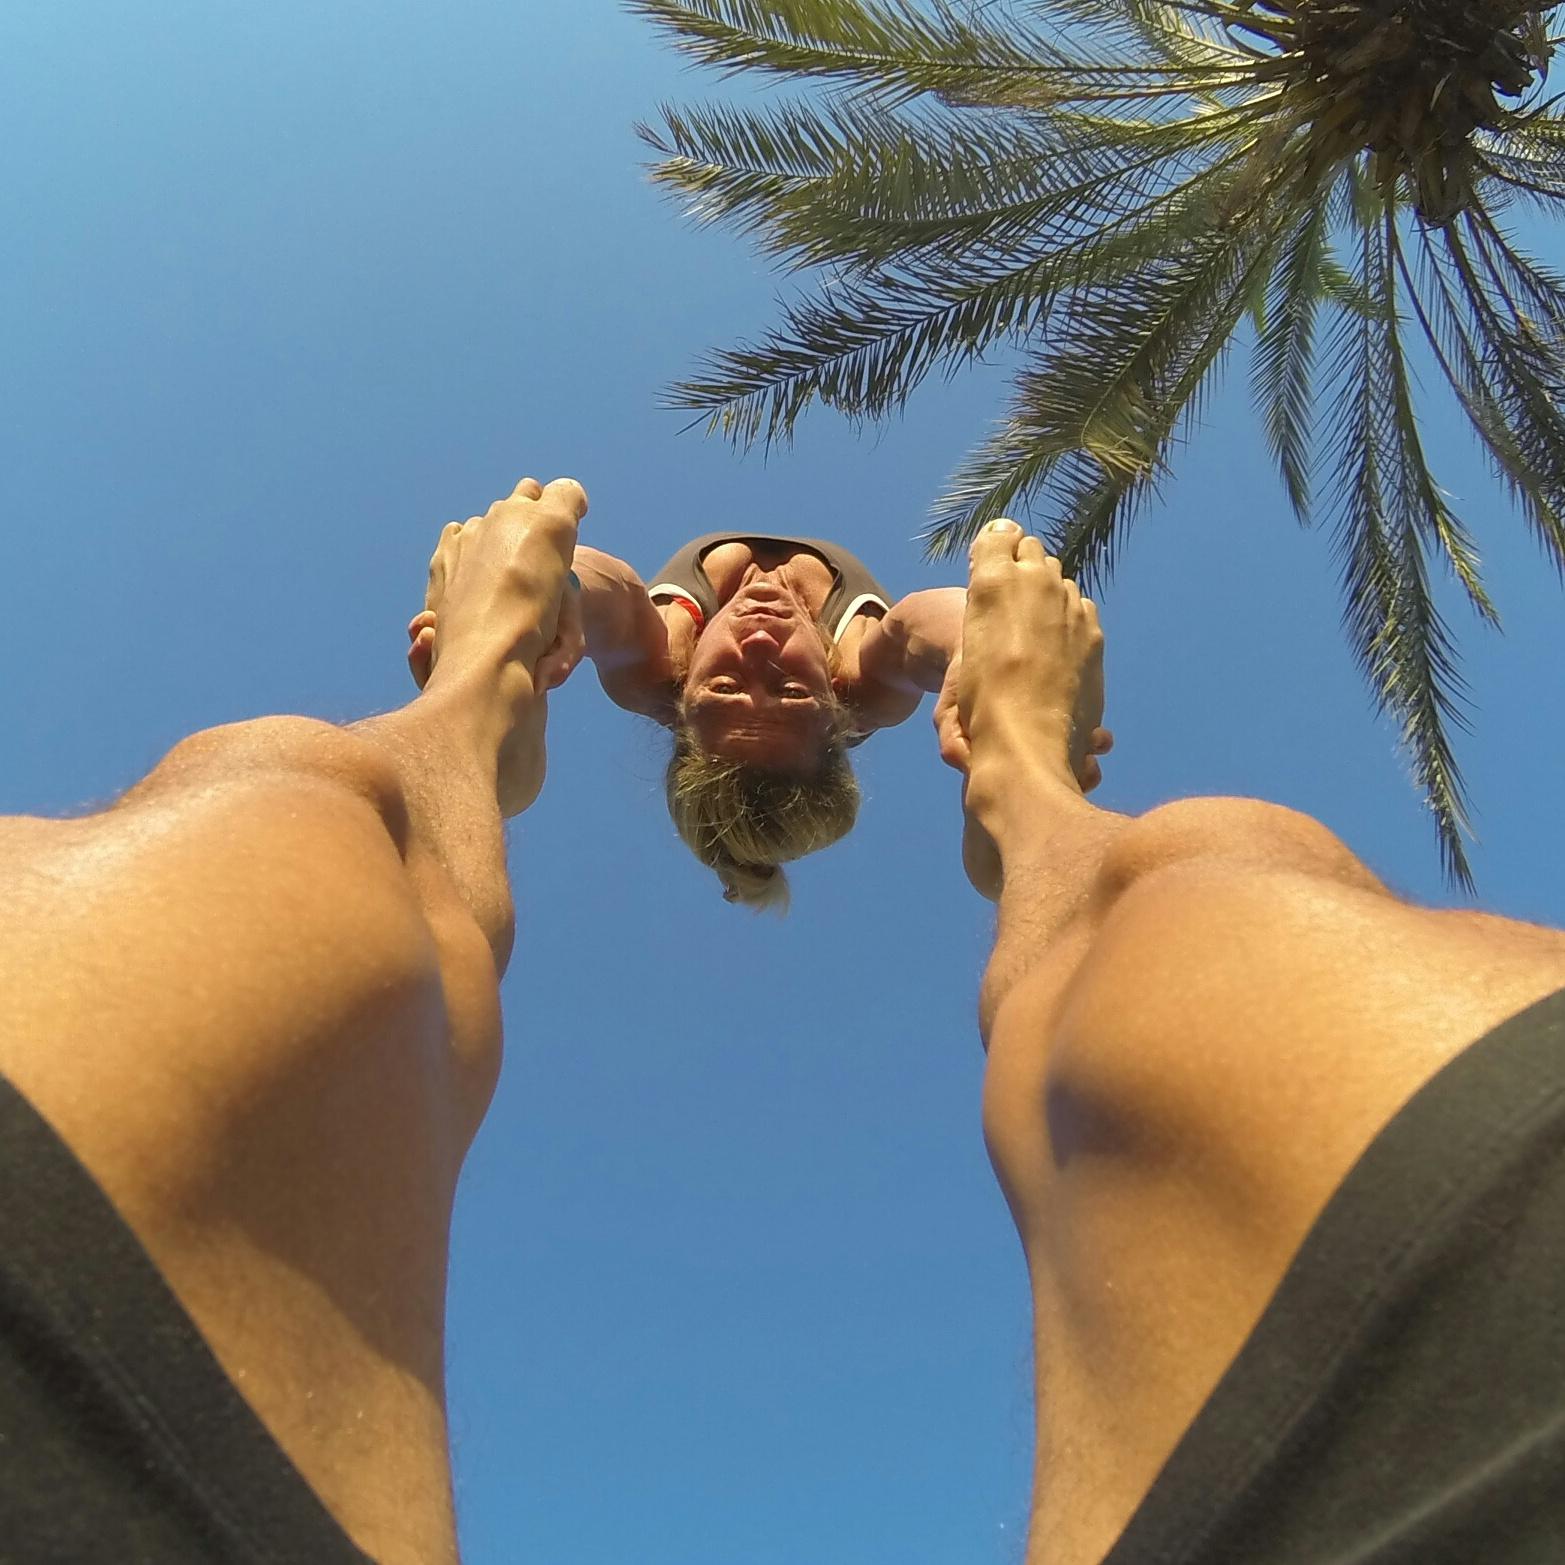 Duo Scacciapensieri Privat Akrobatik Bilder Lorenz Matter Cornelia Clivio